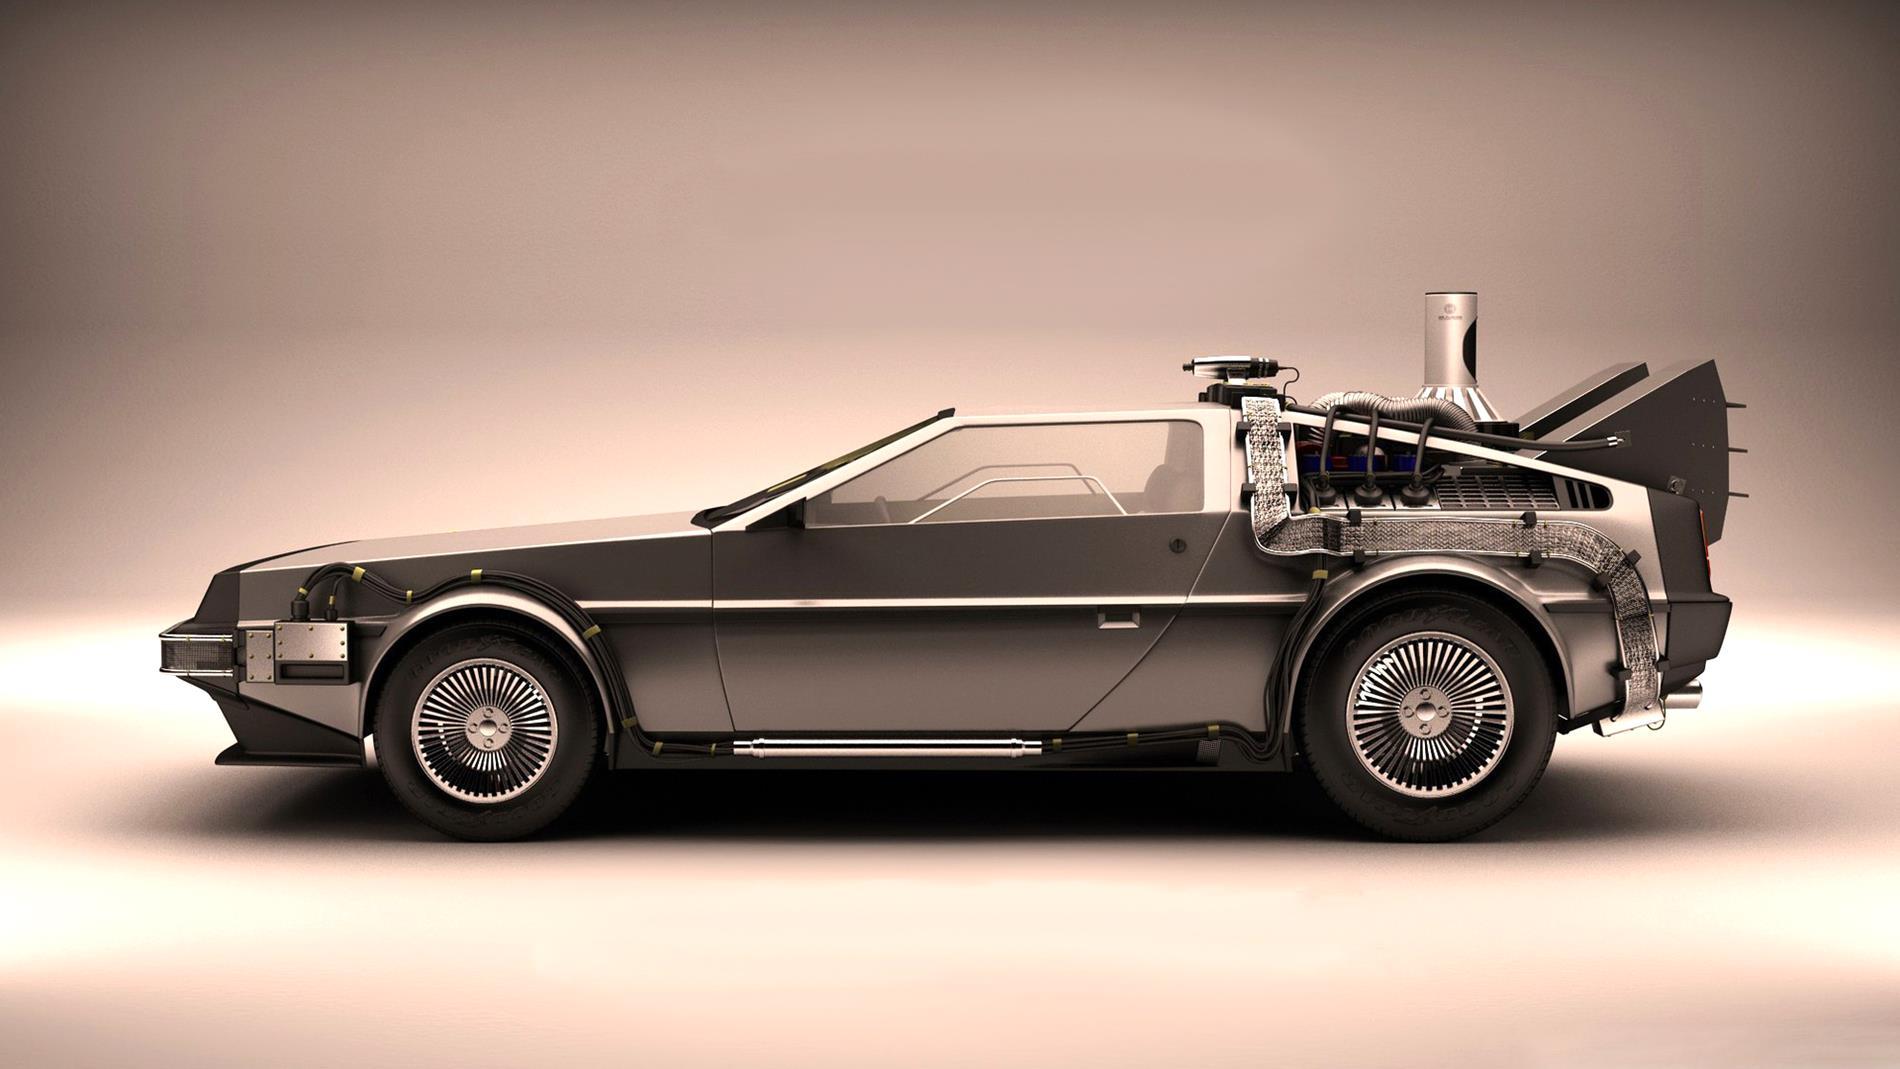 The-Best-Vintage-Car-Wallpapers-8-Best Vintage Car-wv-aston martin-ferarri